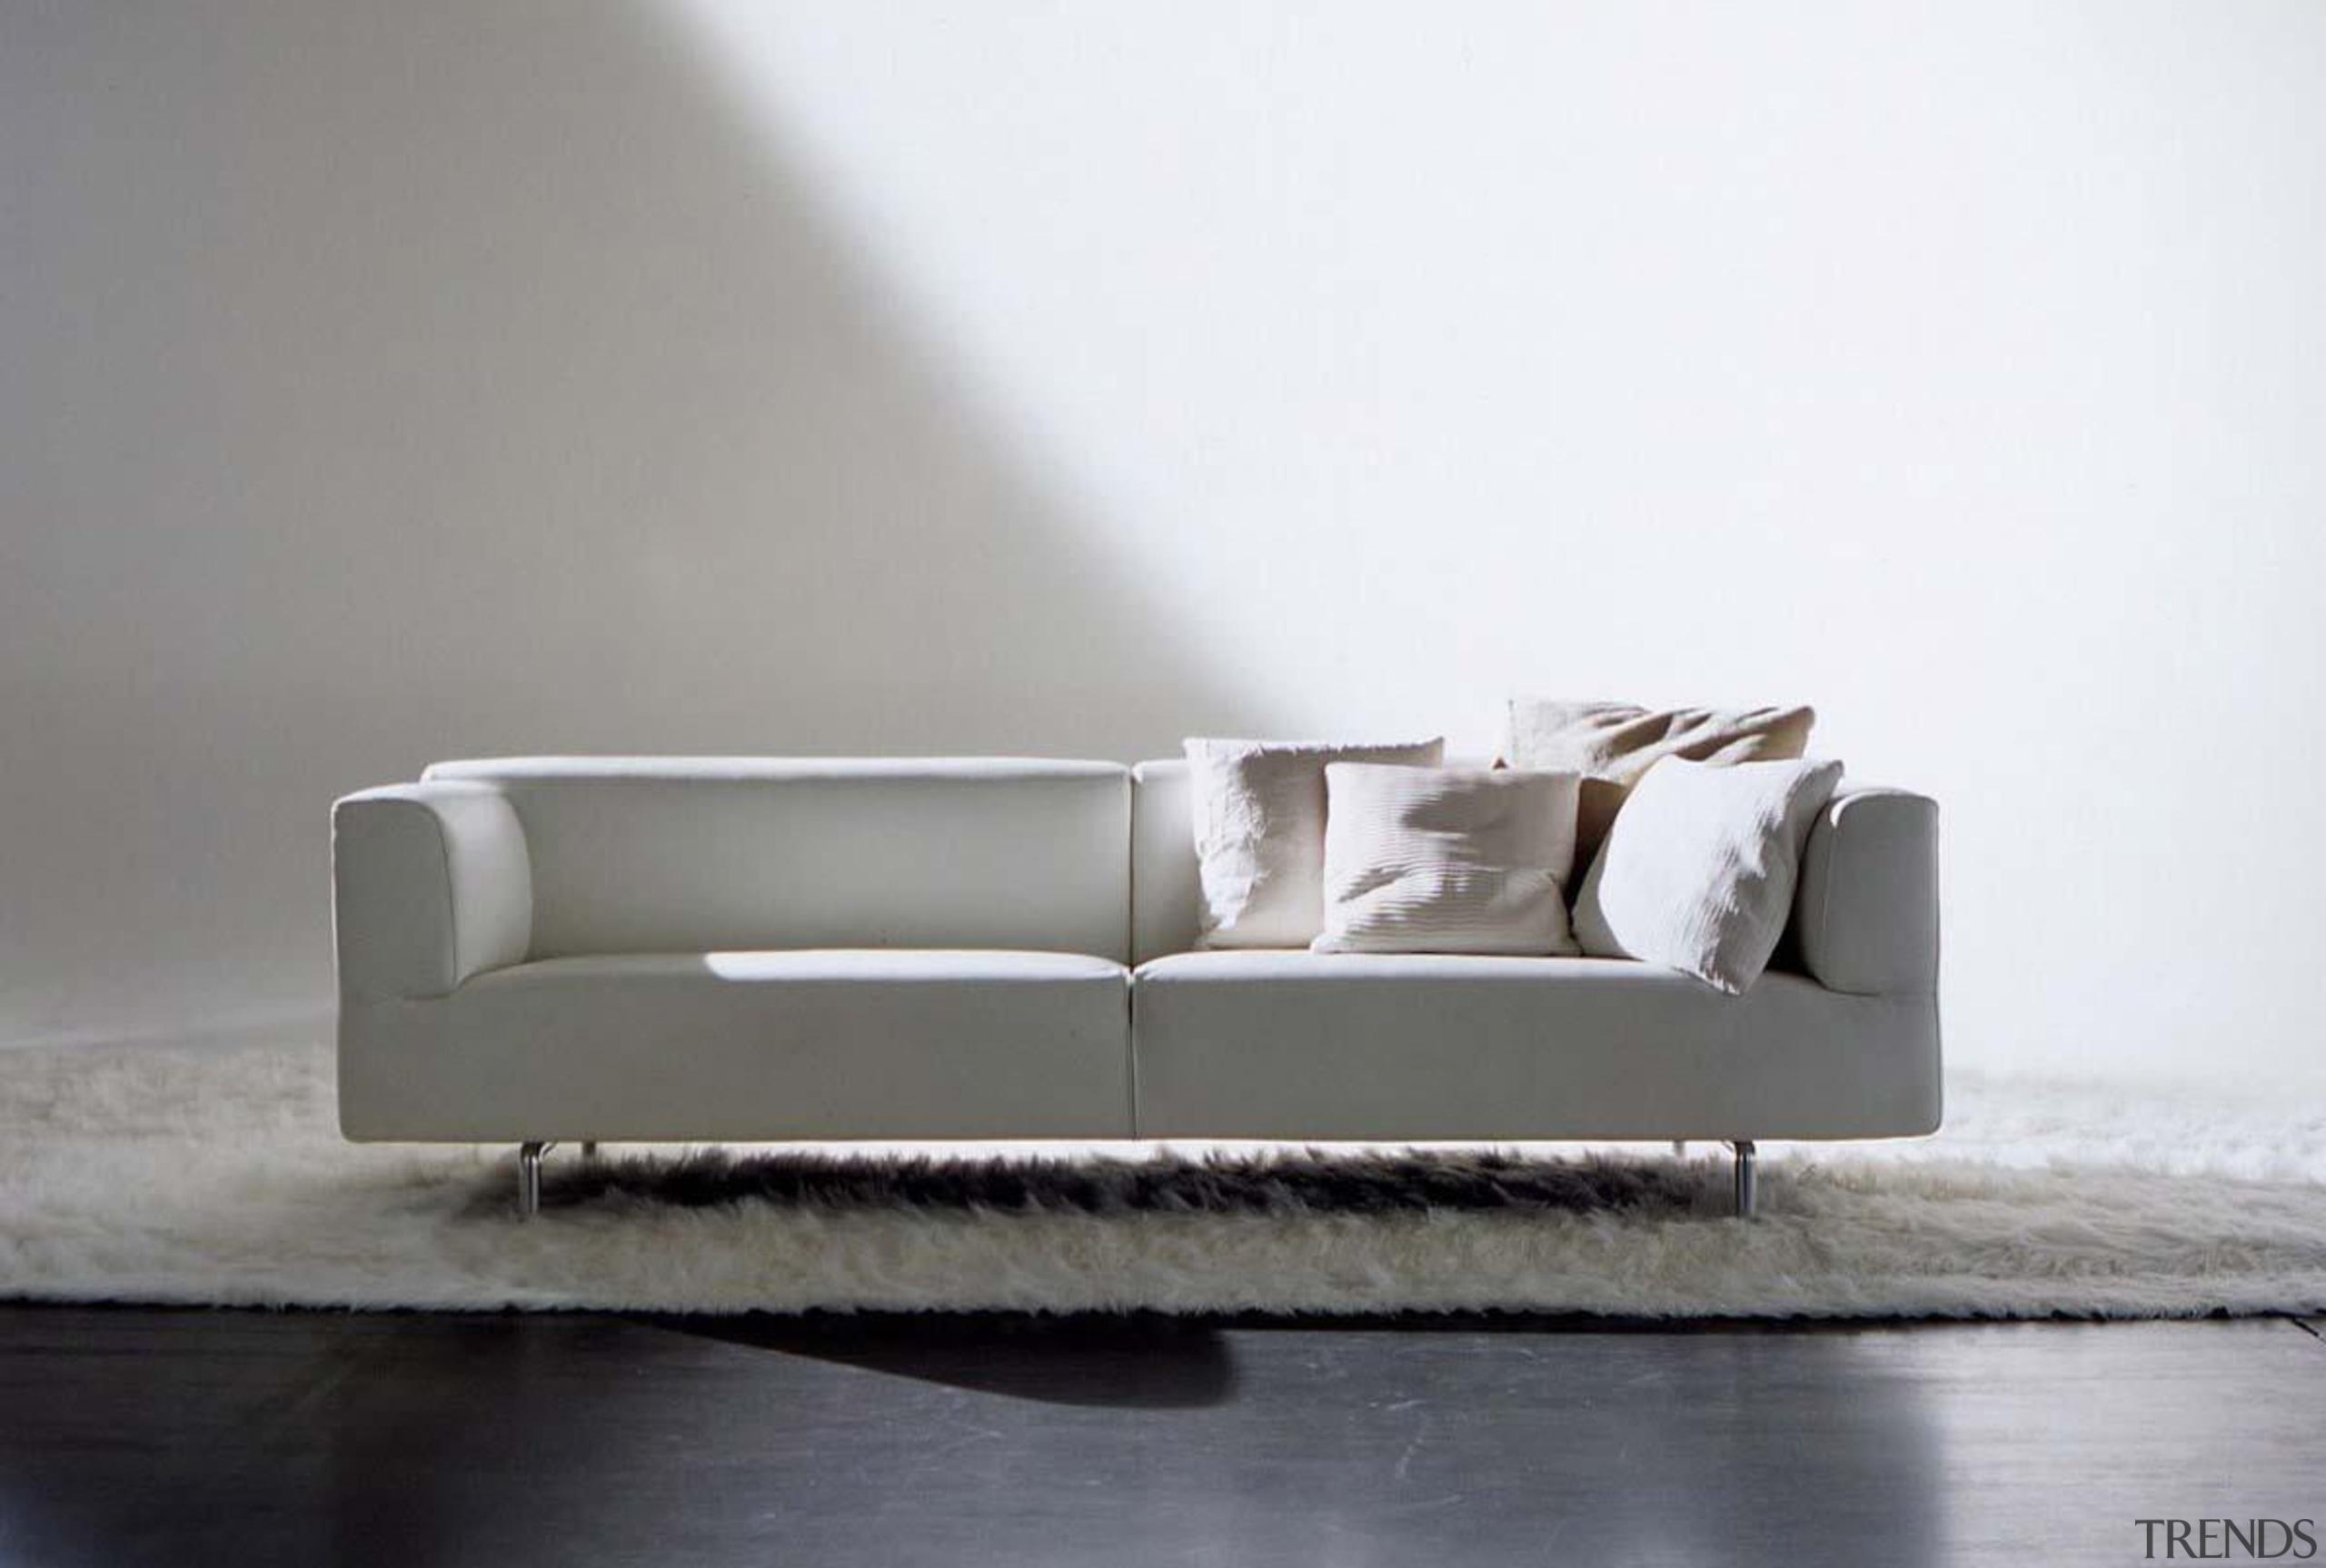 cassinalissonimetsofainstu8.jpg - cassinalissonimetsofainstu8.jpg - angle   chaise longue angle, chaise longue, couch, furniture, interior design, loveseat, product design, sofa bed, studio couch, table, gray, white